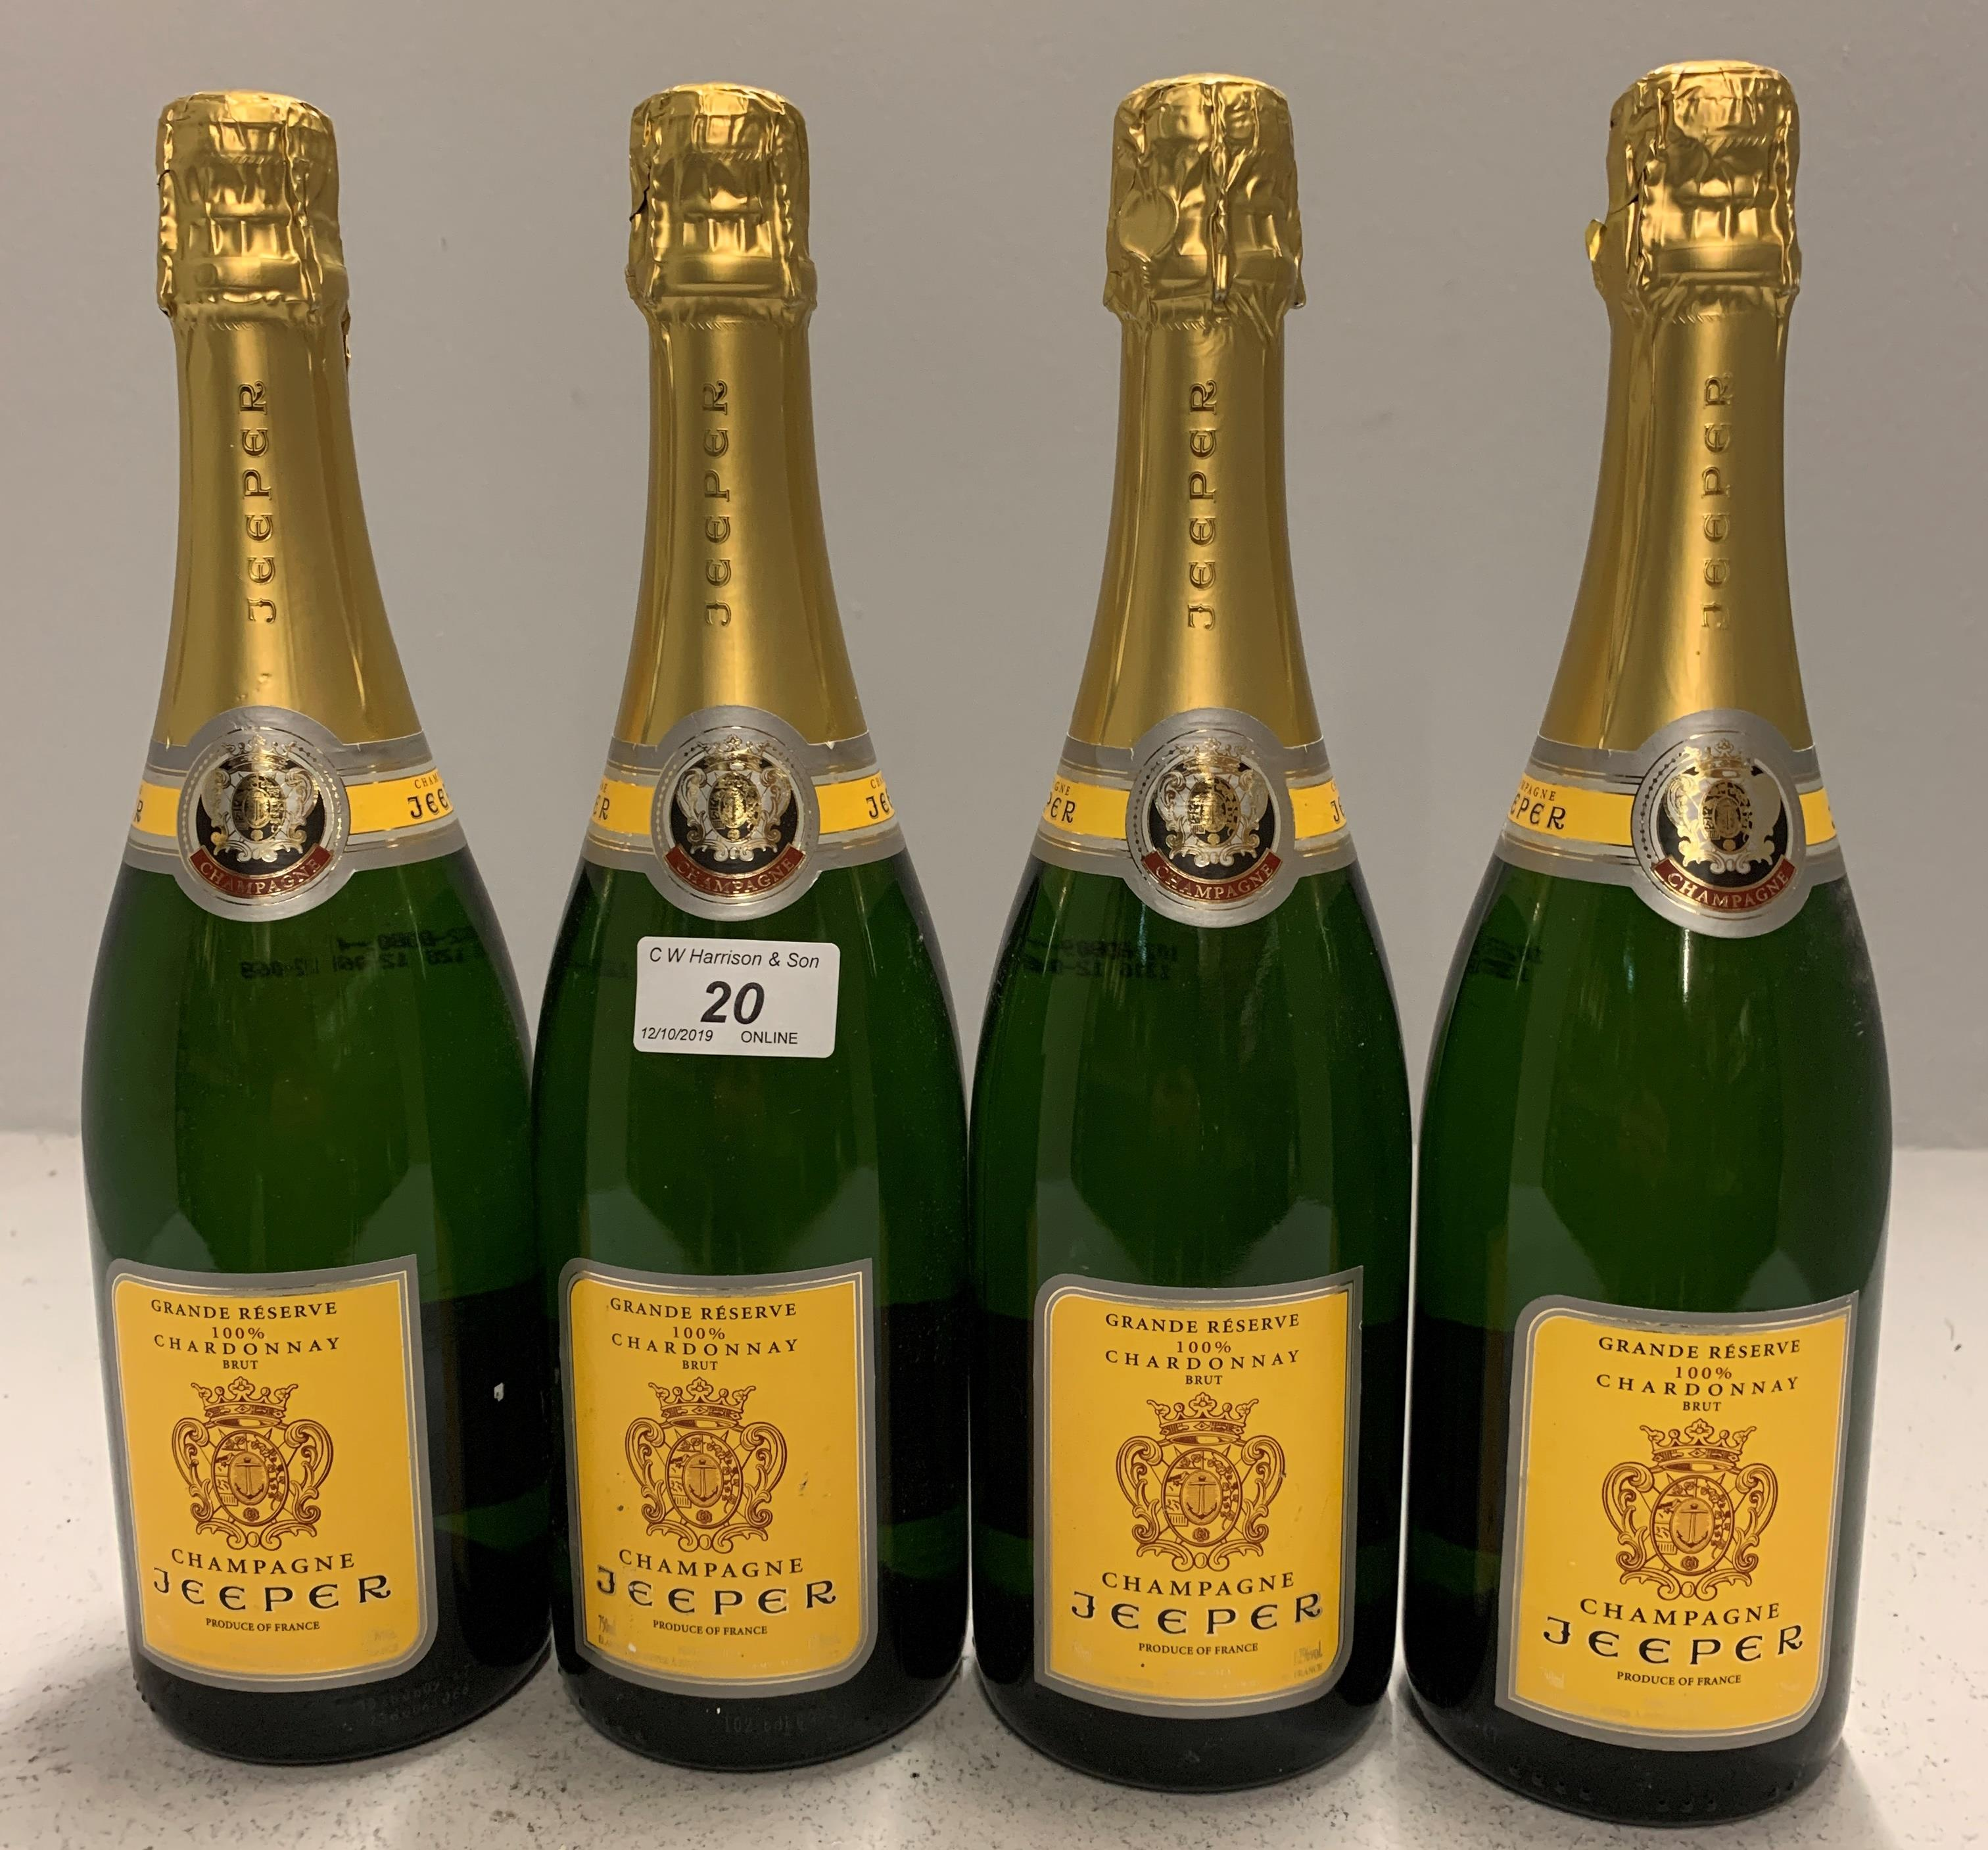 Lot 20 - 4 x bottles Grand Reserve 100% Chardonna